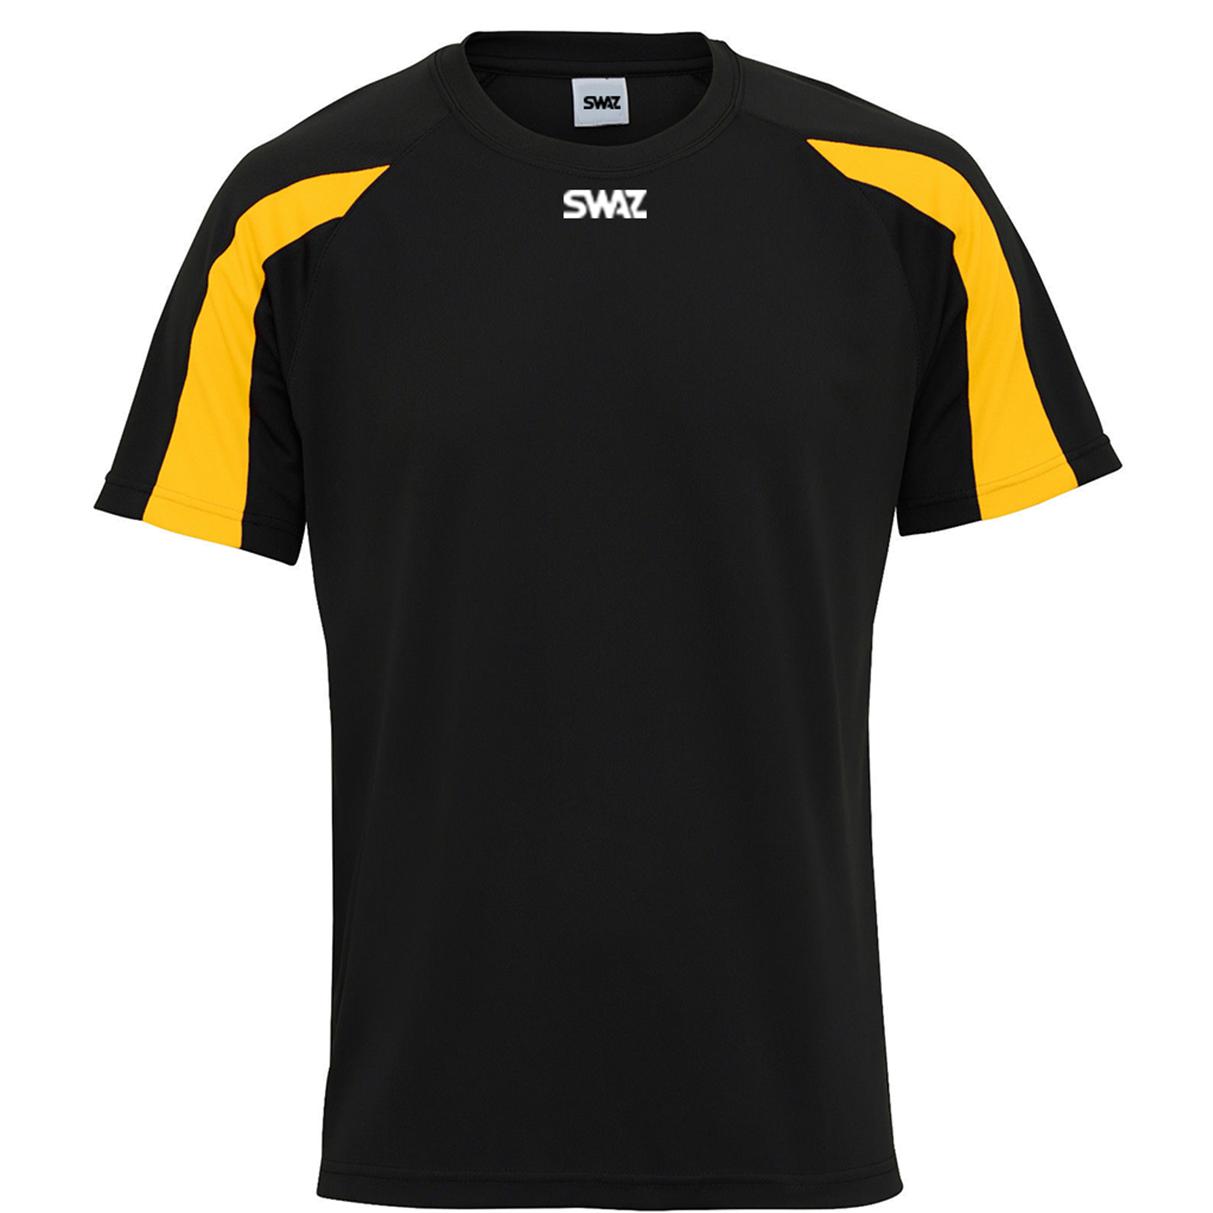 SWAZ Premier Training T-Shirt – Black/Amber